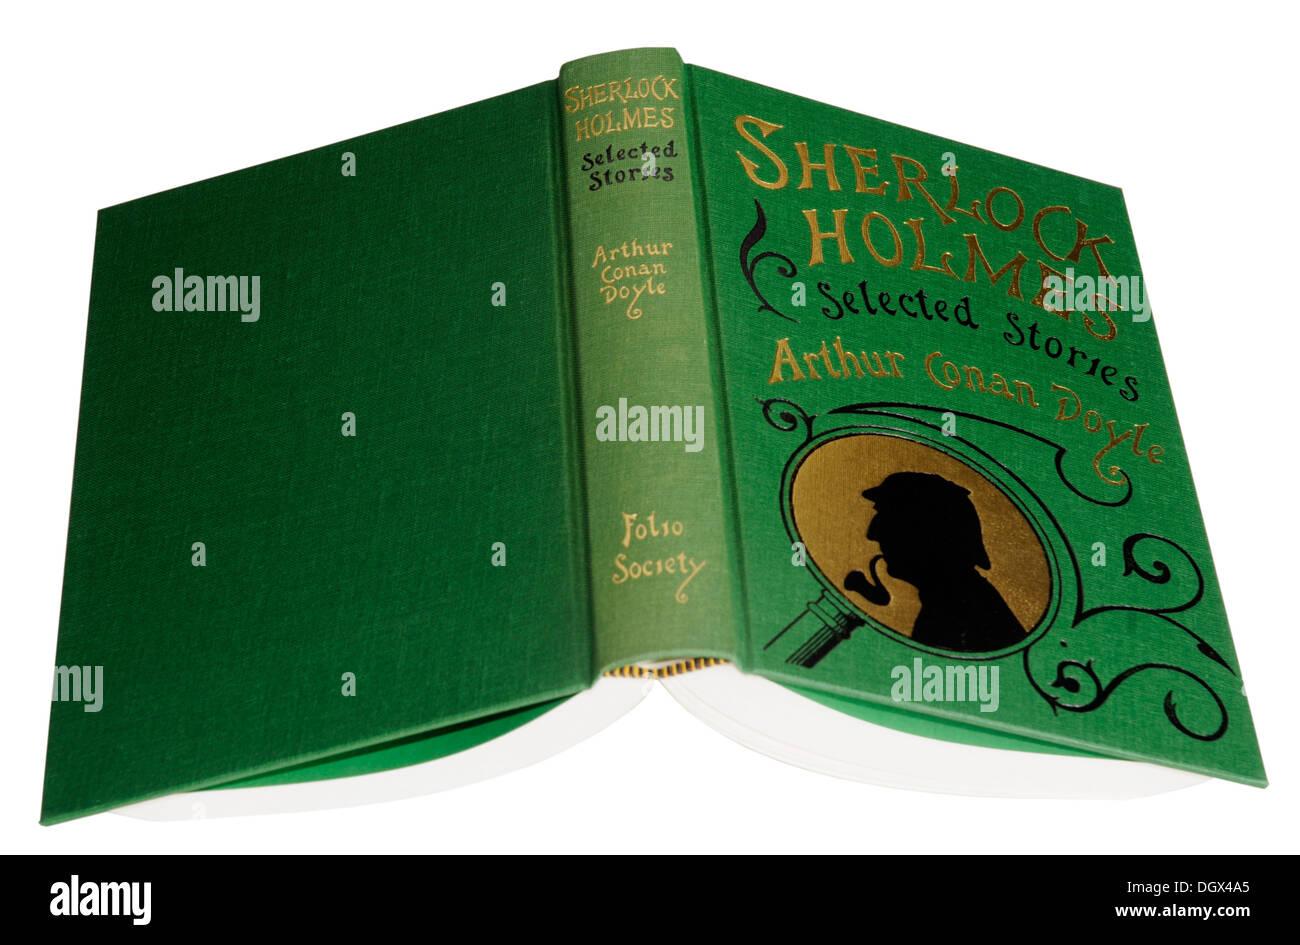 A Folio Society edition of Sherlock Holmes Stories by Sir Arthur Conan Doyle - Stock Image